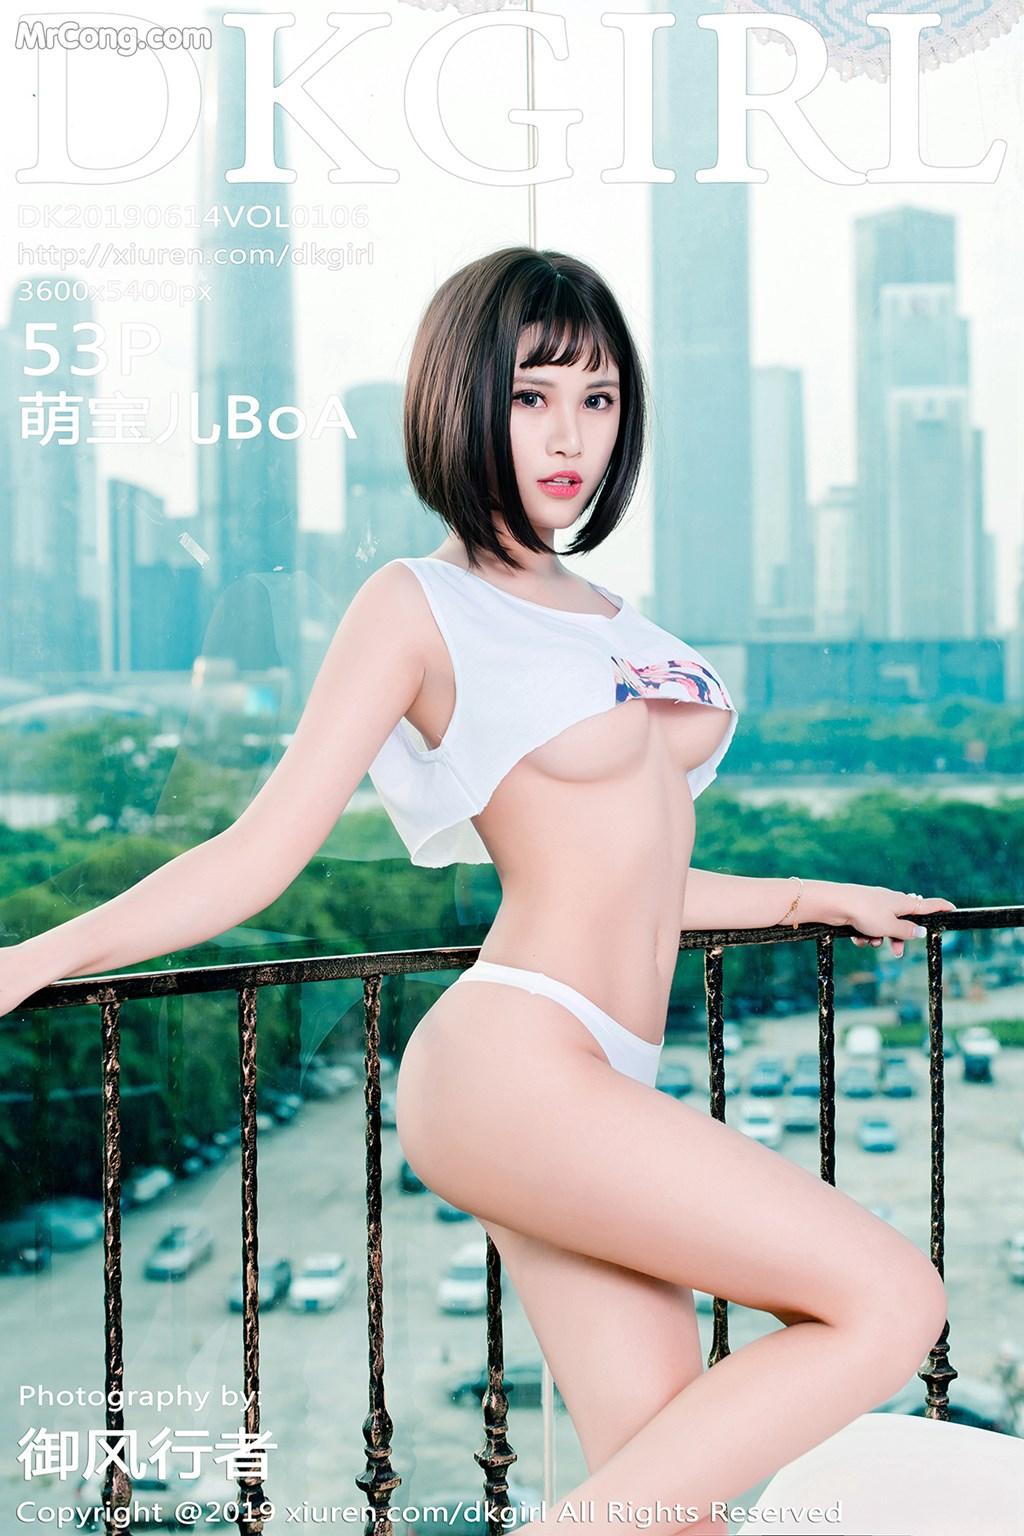 DKGirl Vol.106: Meng Bao Er (萌宝儿BoA) (54 ảnh)